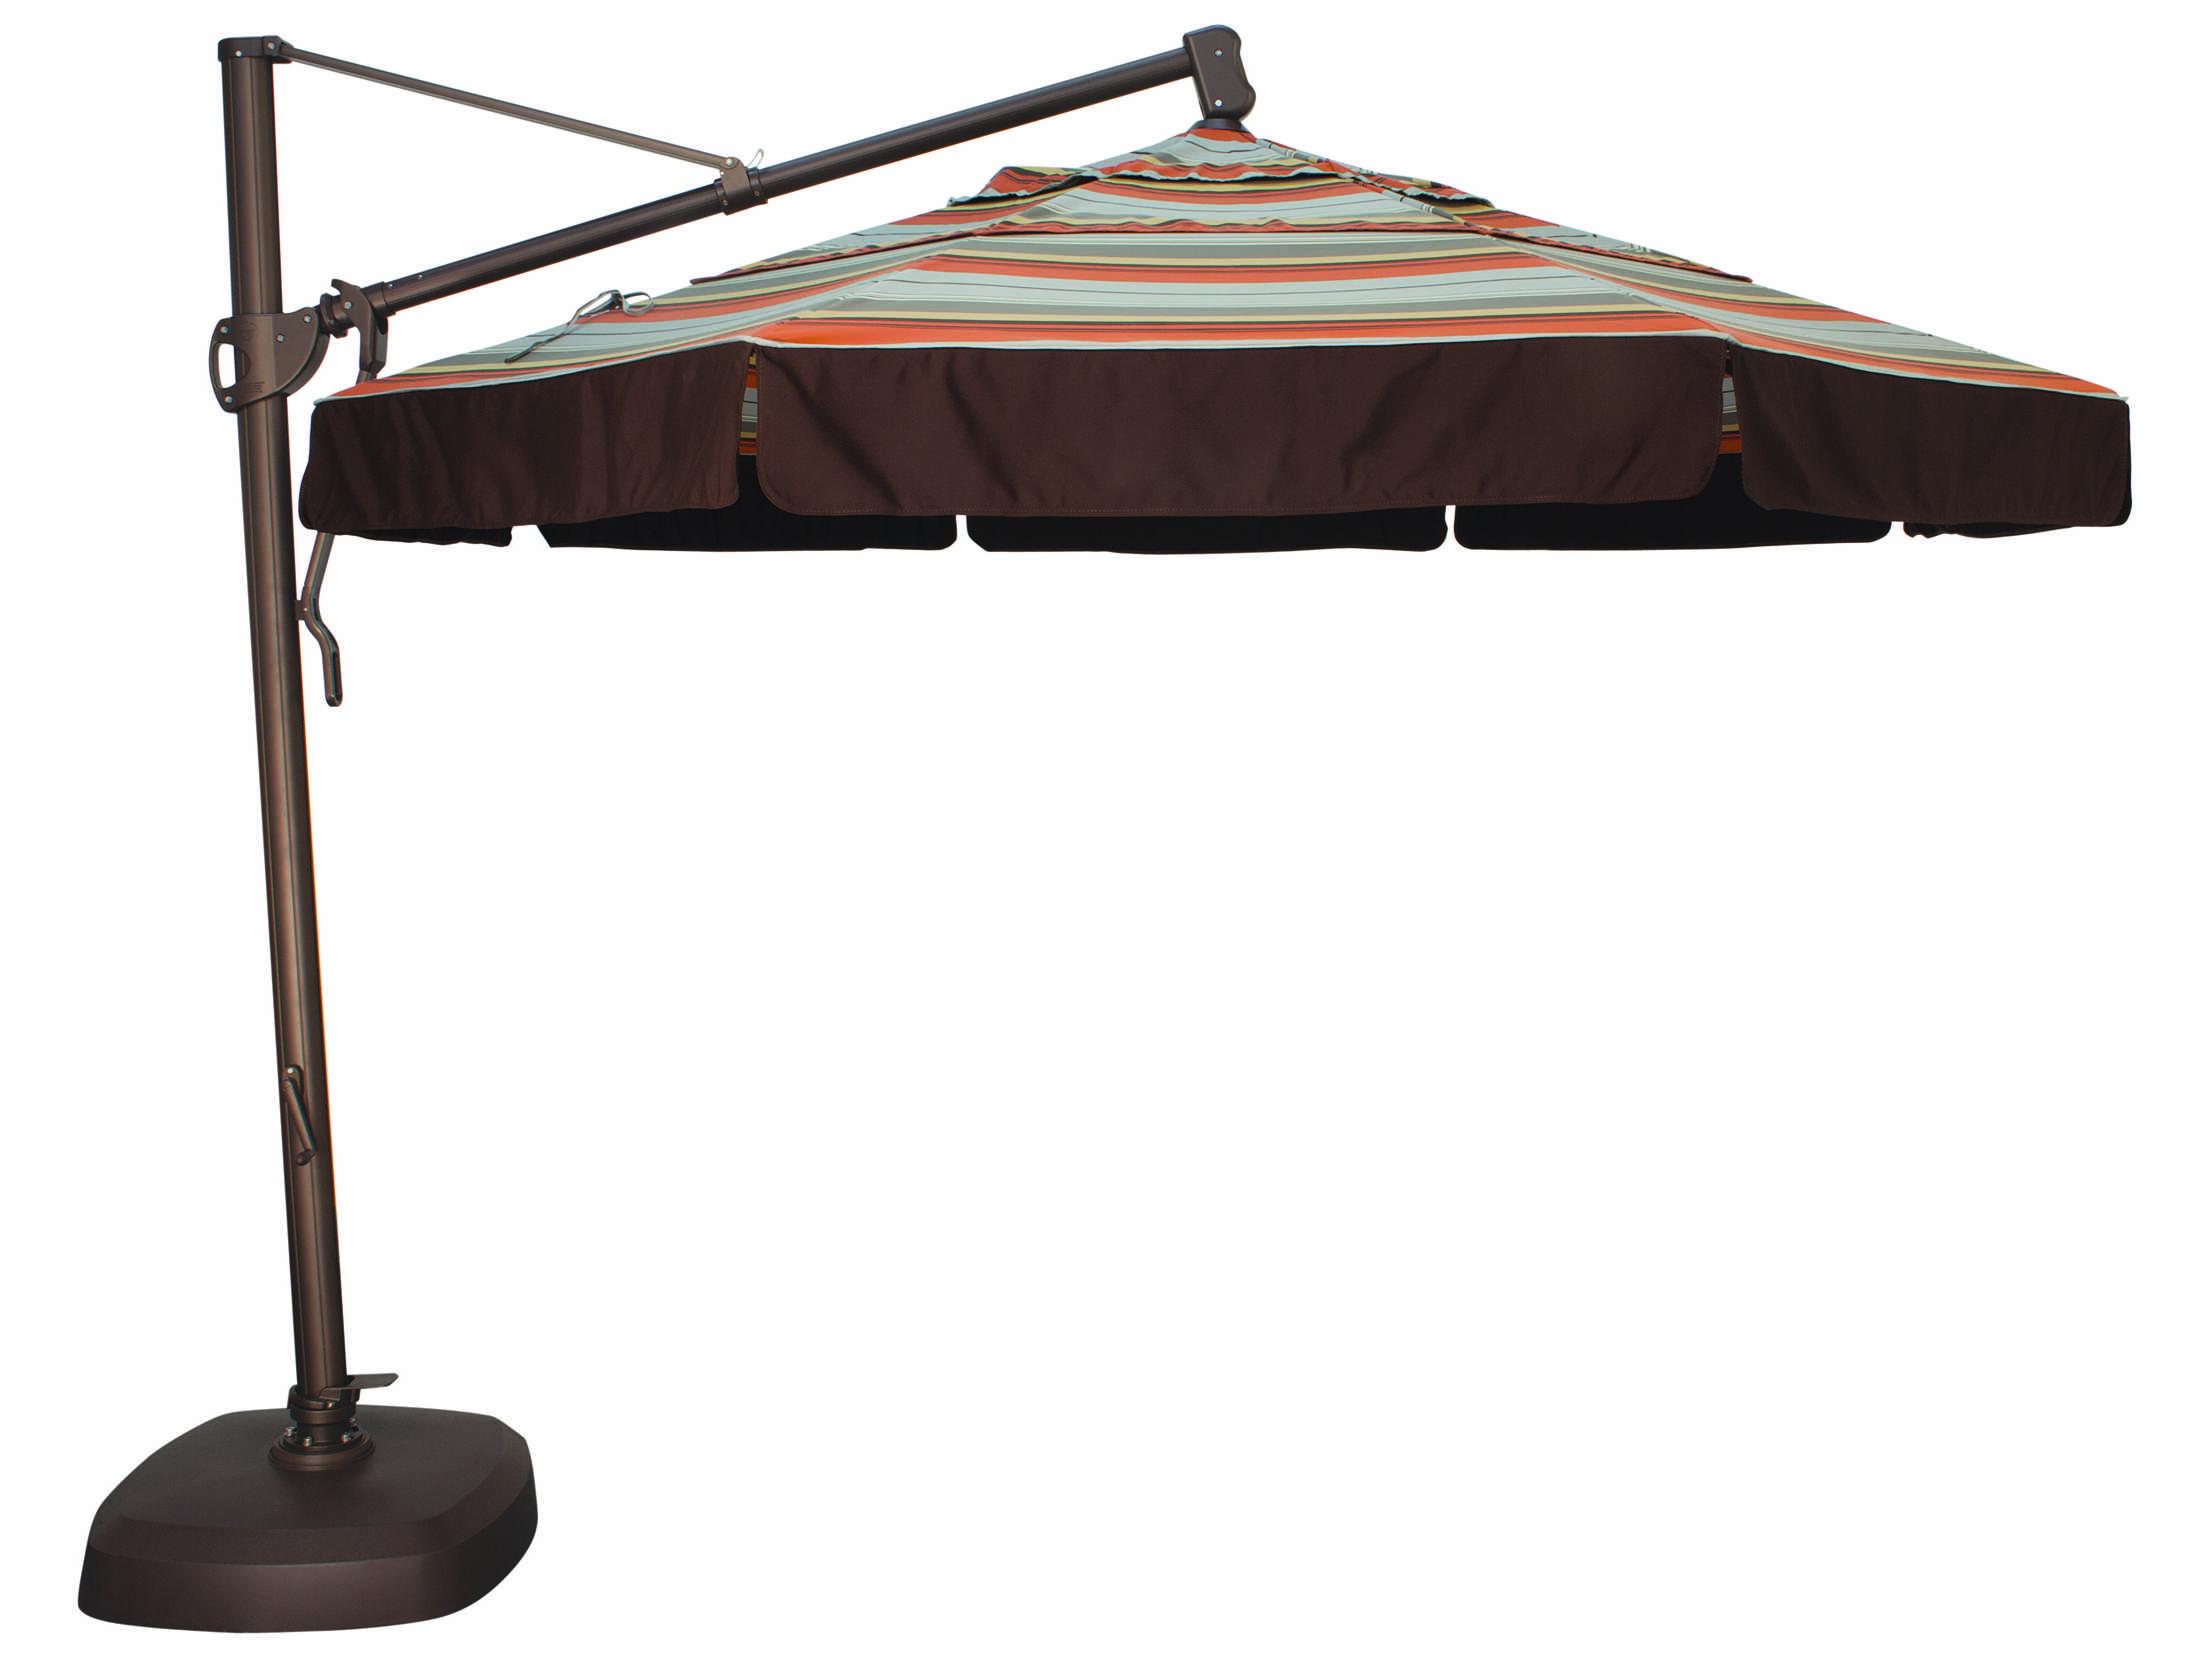 Treasure garden cantilever aluminum 1139 foot wide crank for Garden treasures patio umbrella cover